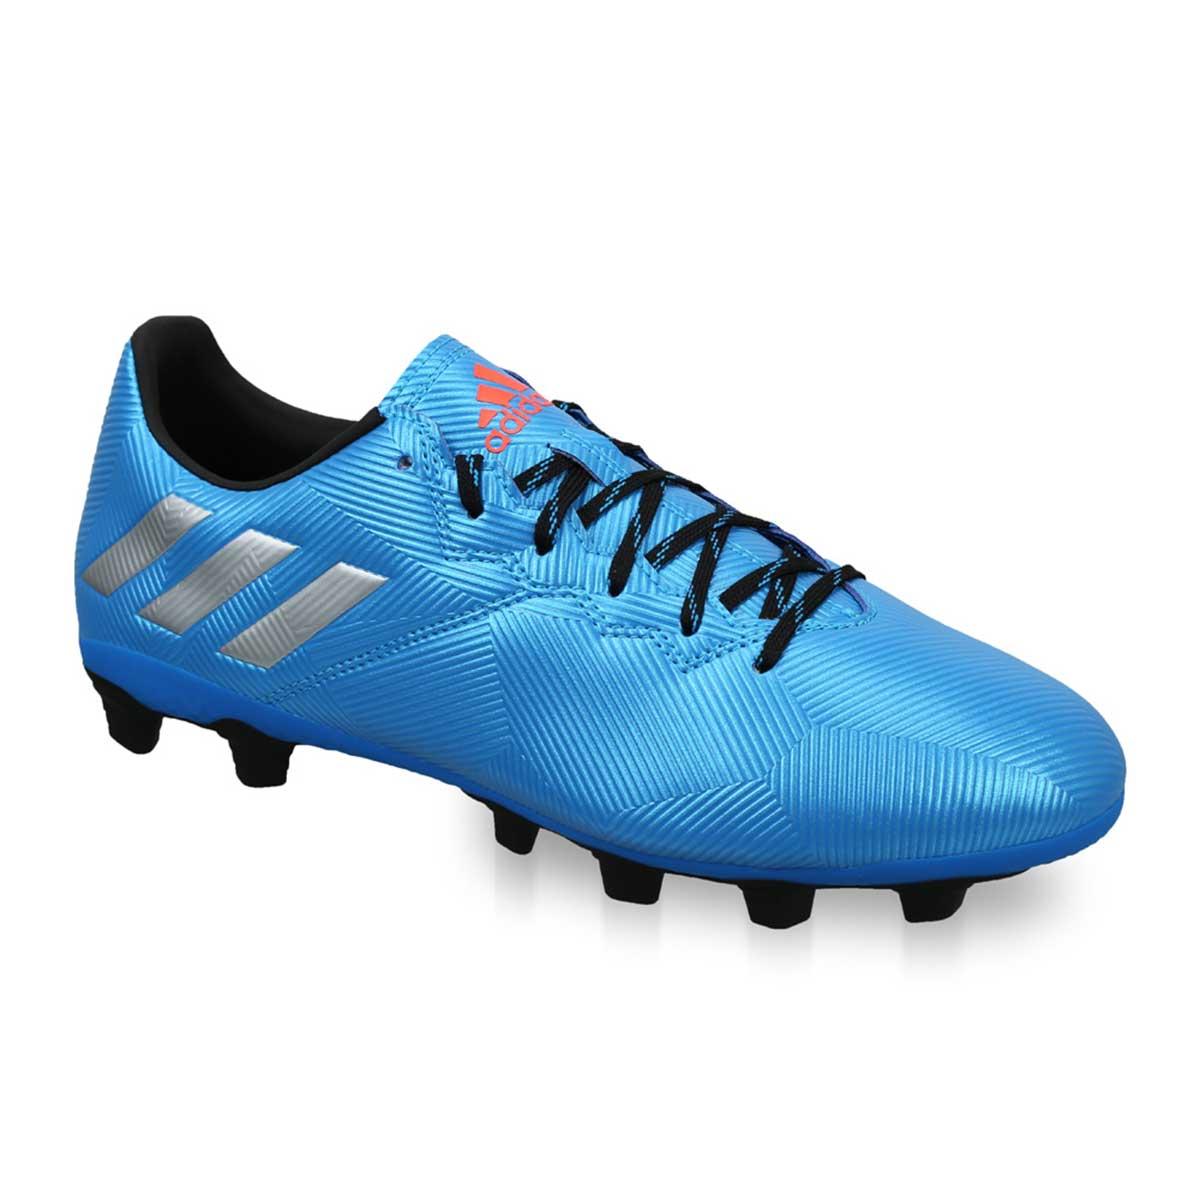 Buy Adidas Messi 16.4 FXG Football